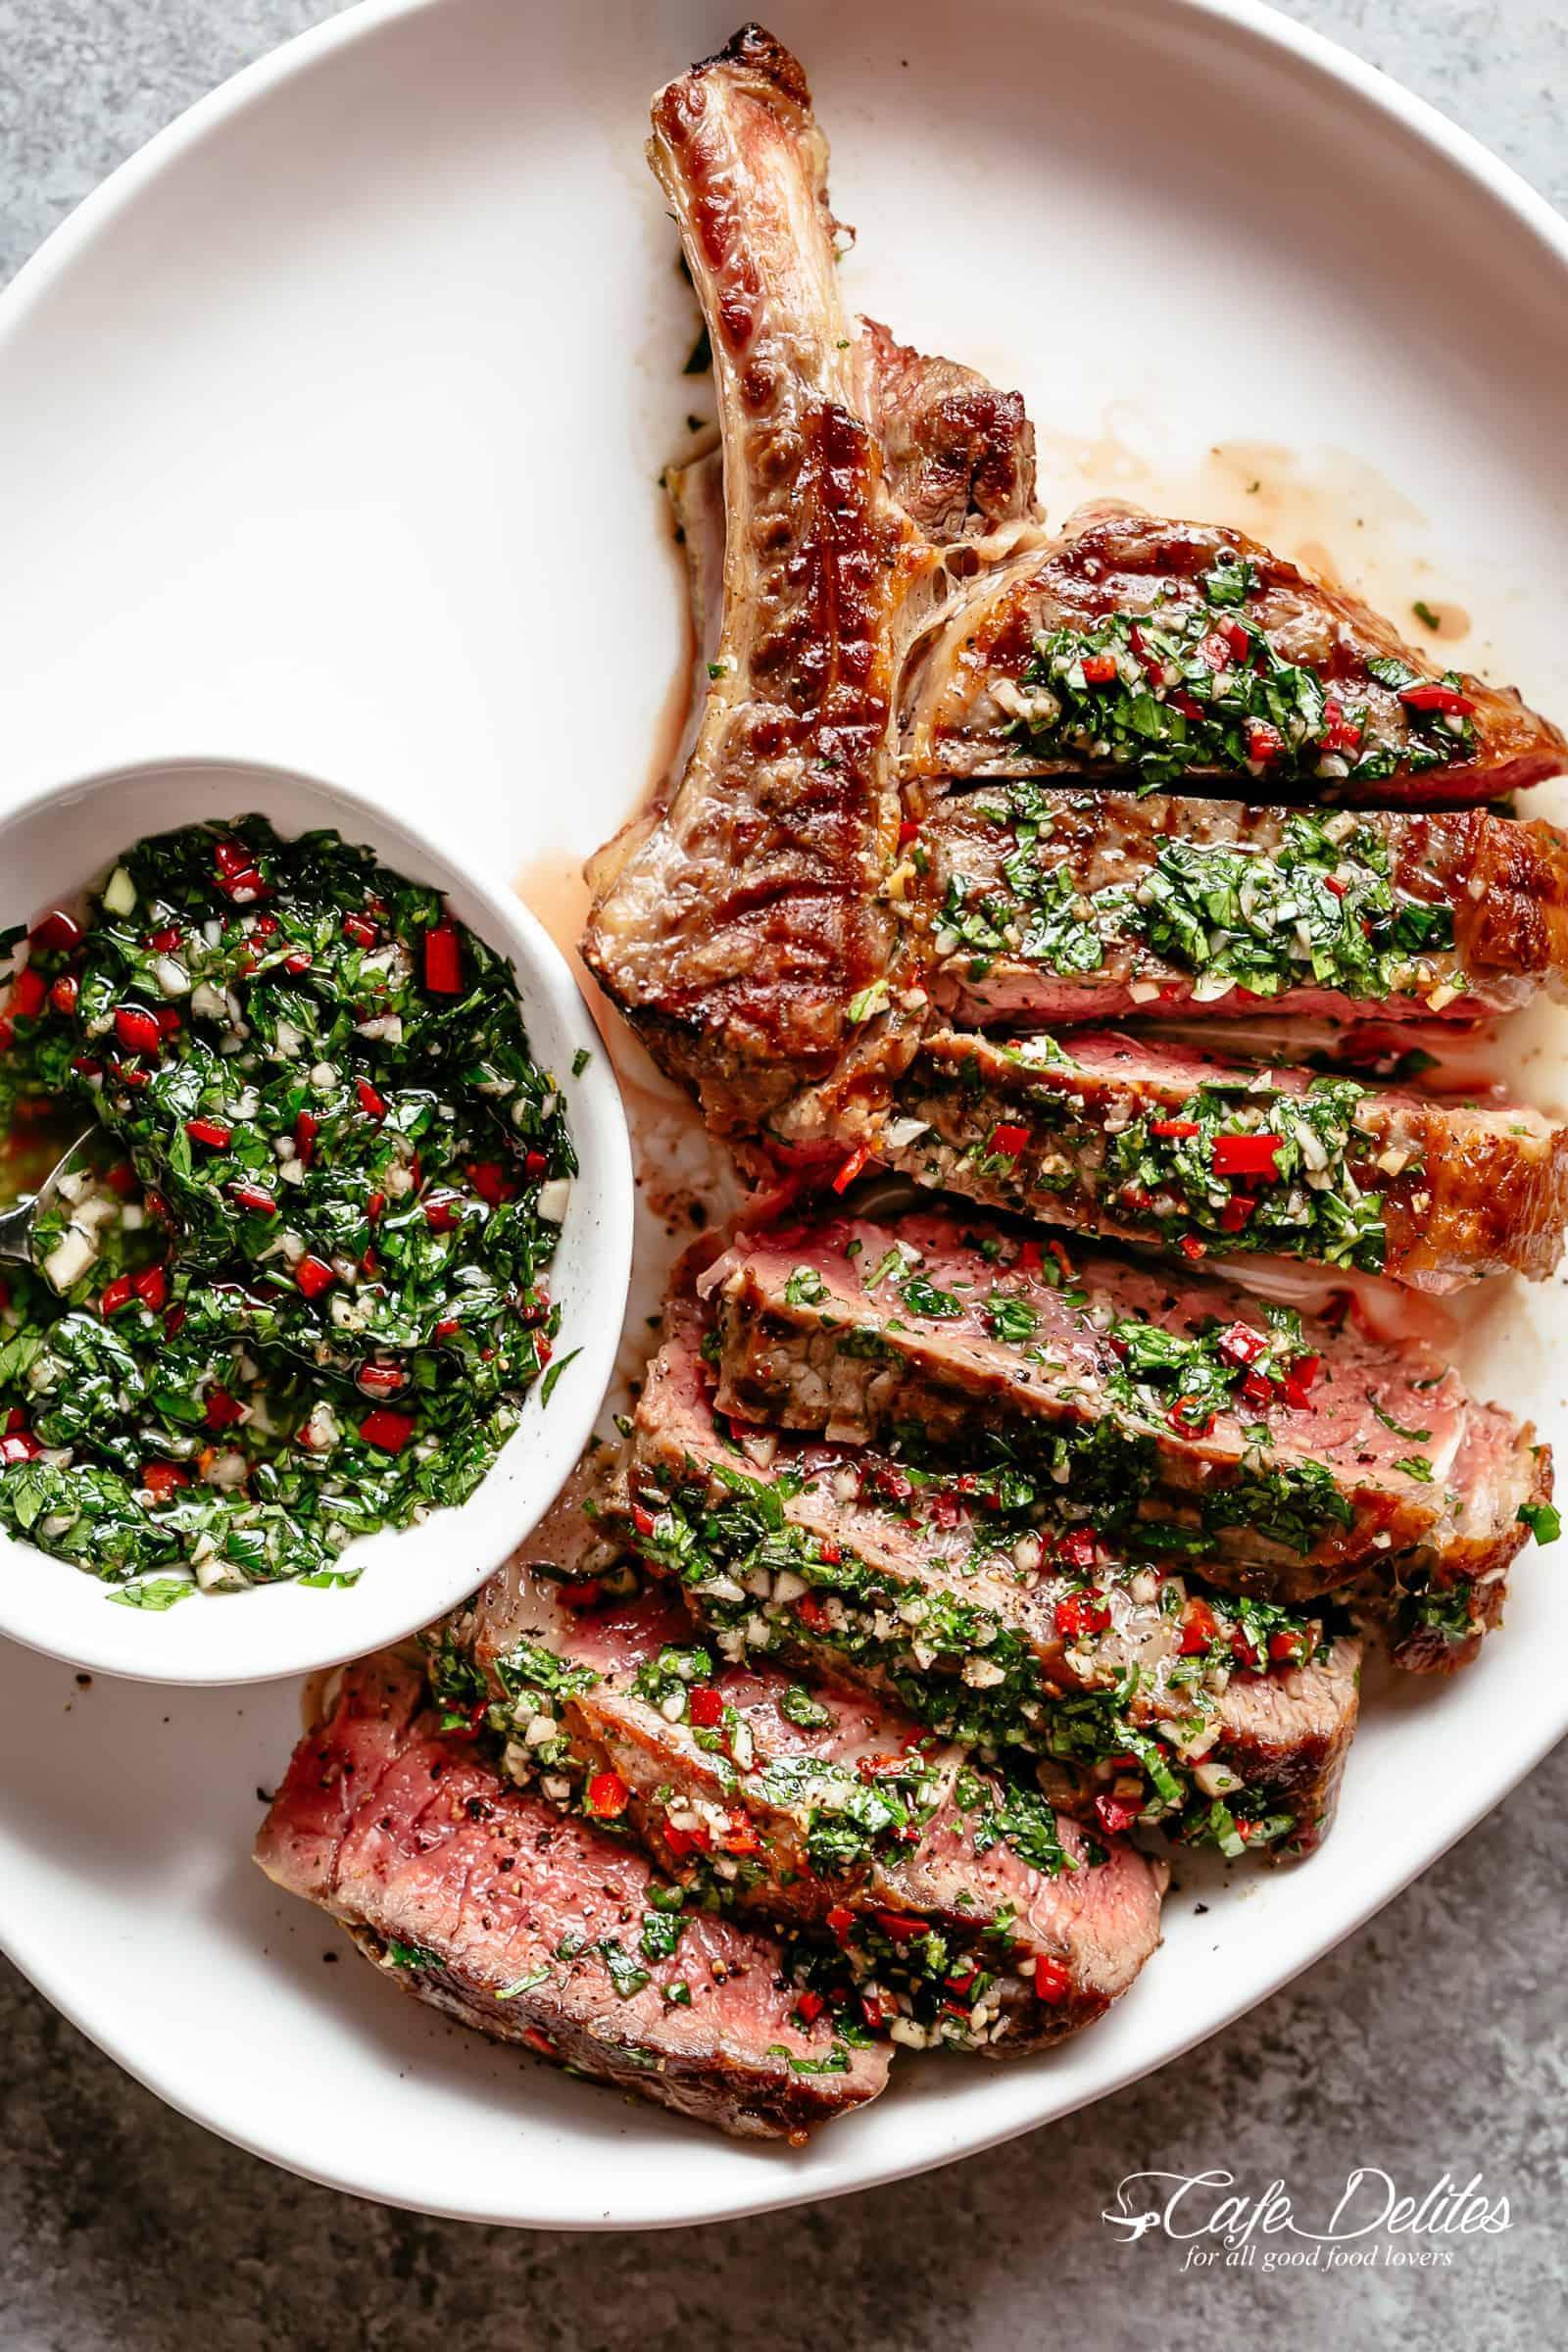 Tomahawk Steak with Chimichurri